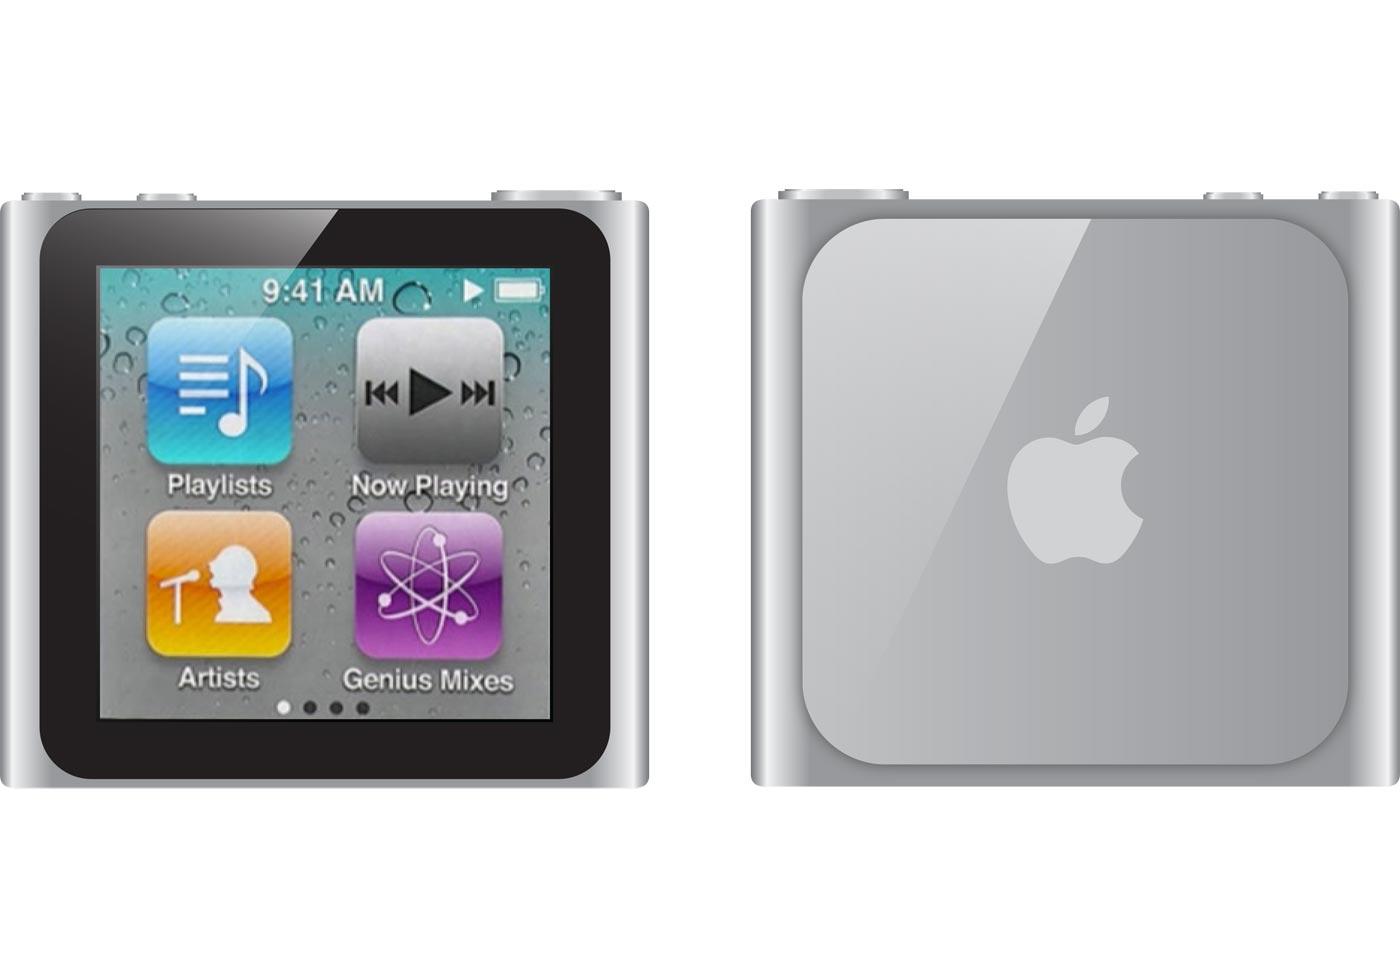 iPod nano Free Vector  Download Free Vector Art Stock